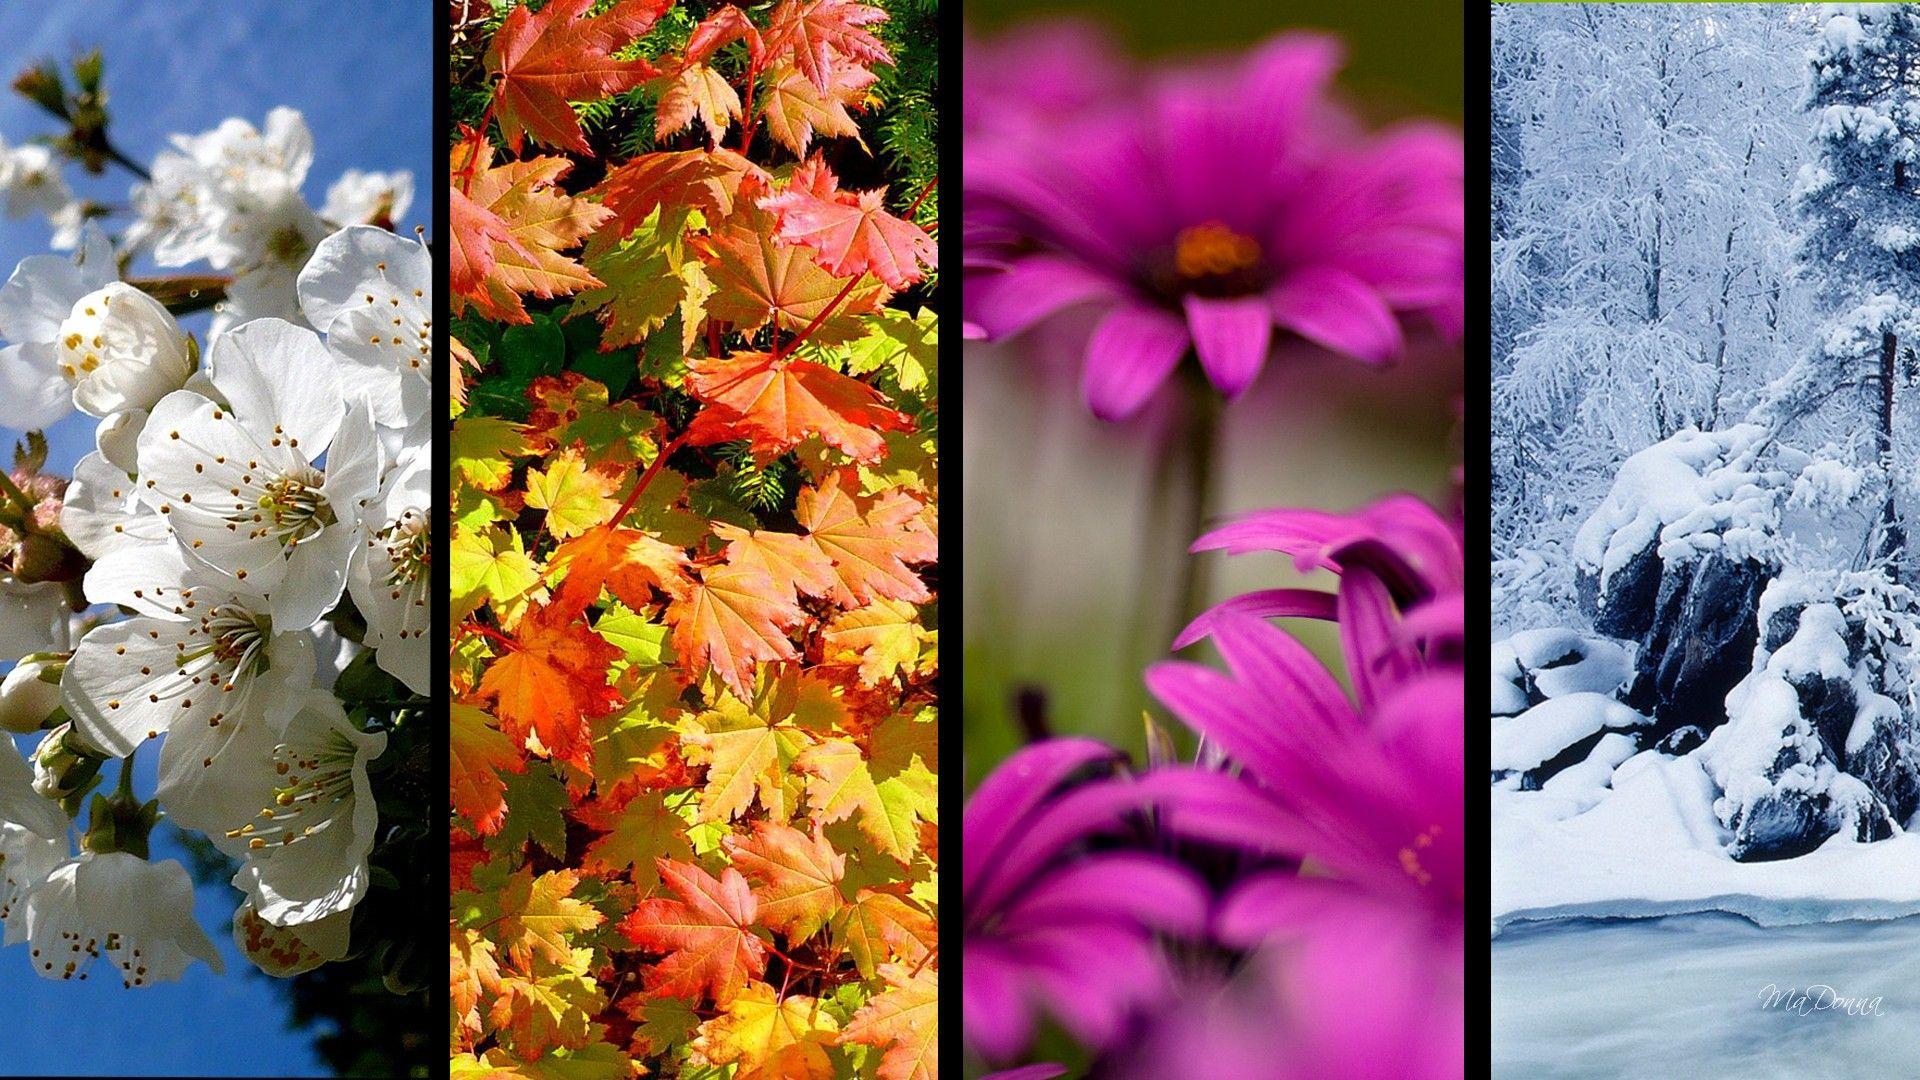 Summerflowers Wallpaper Stores Seasons Wallpaper